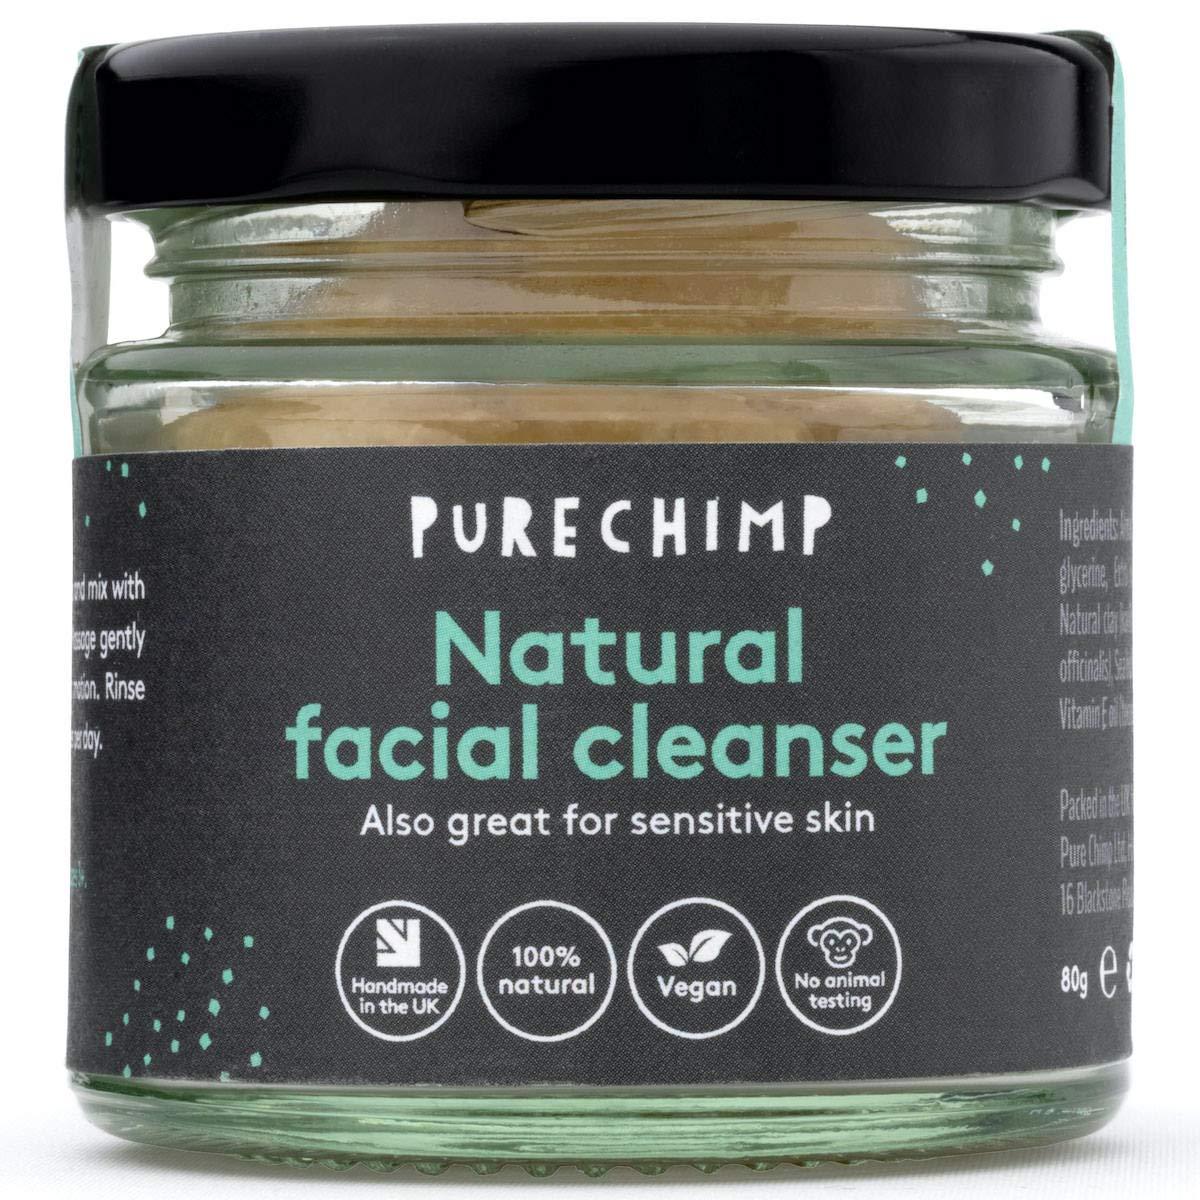 PureChimp Natural Facial Cleanser